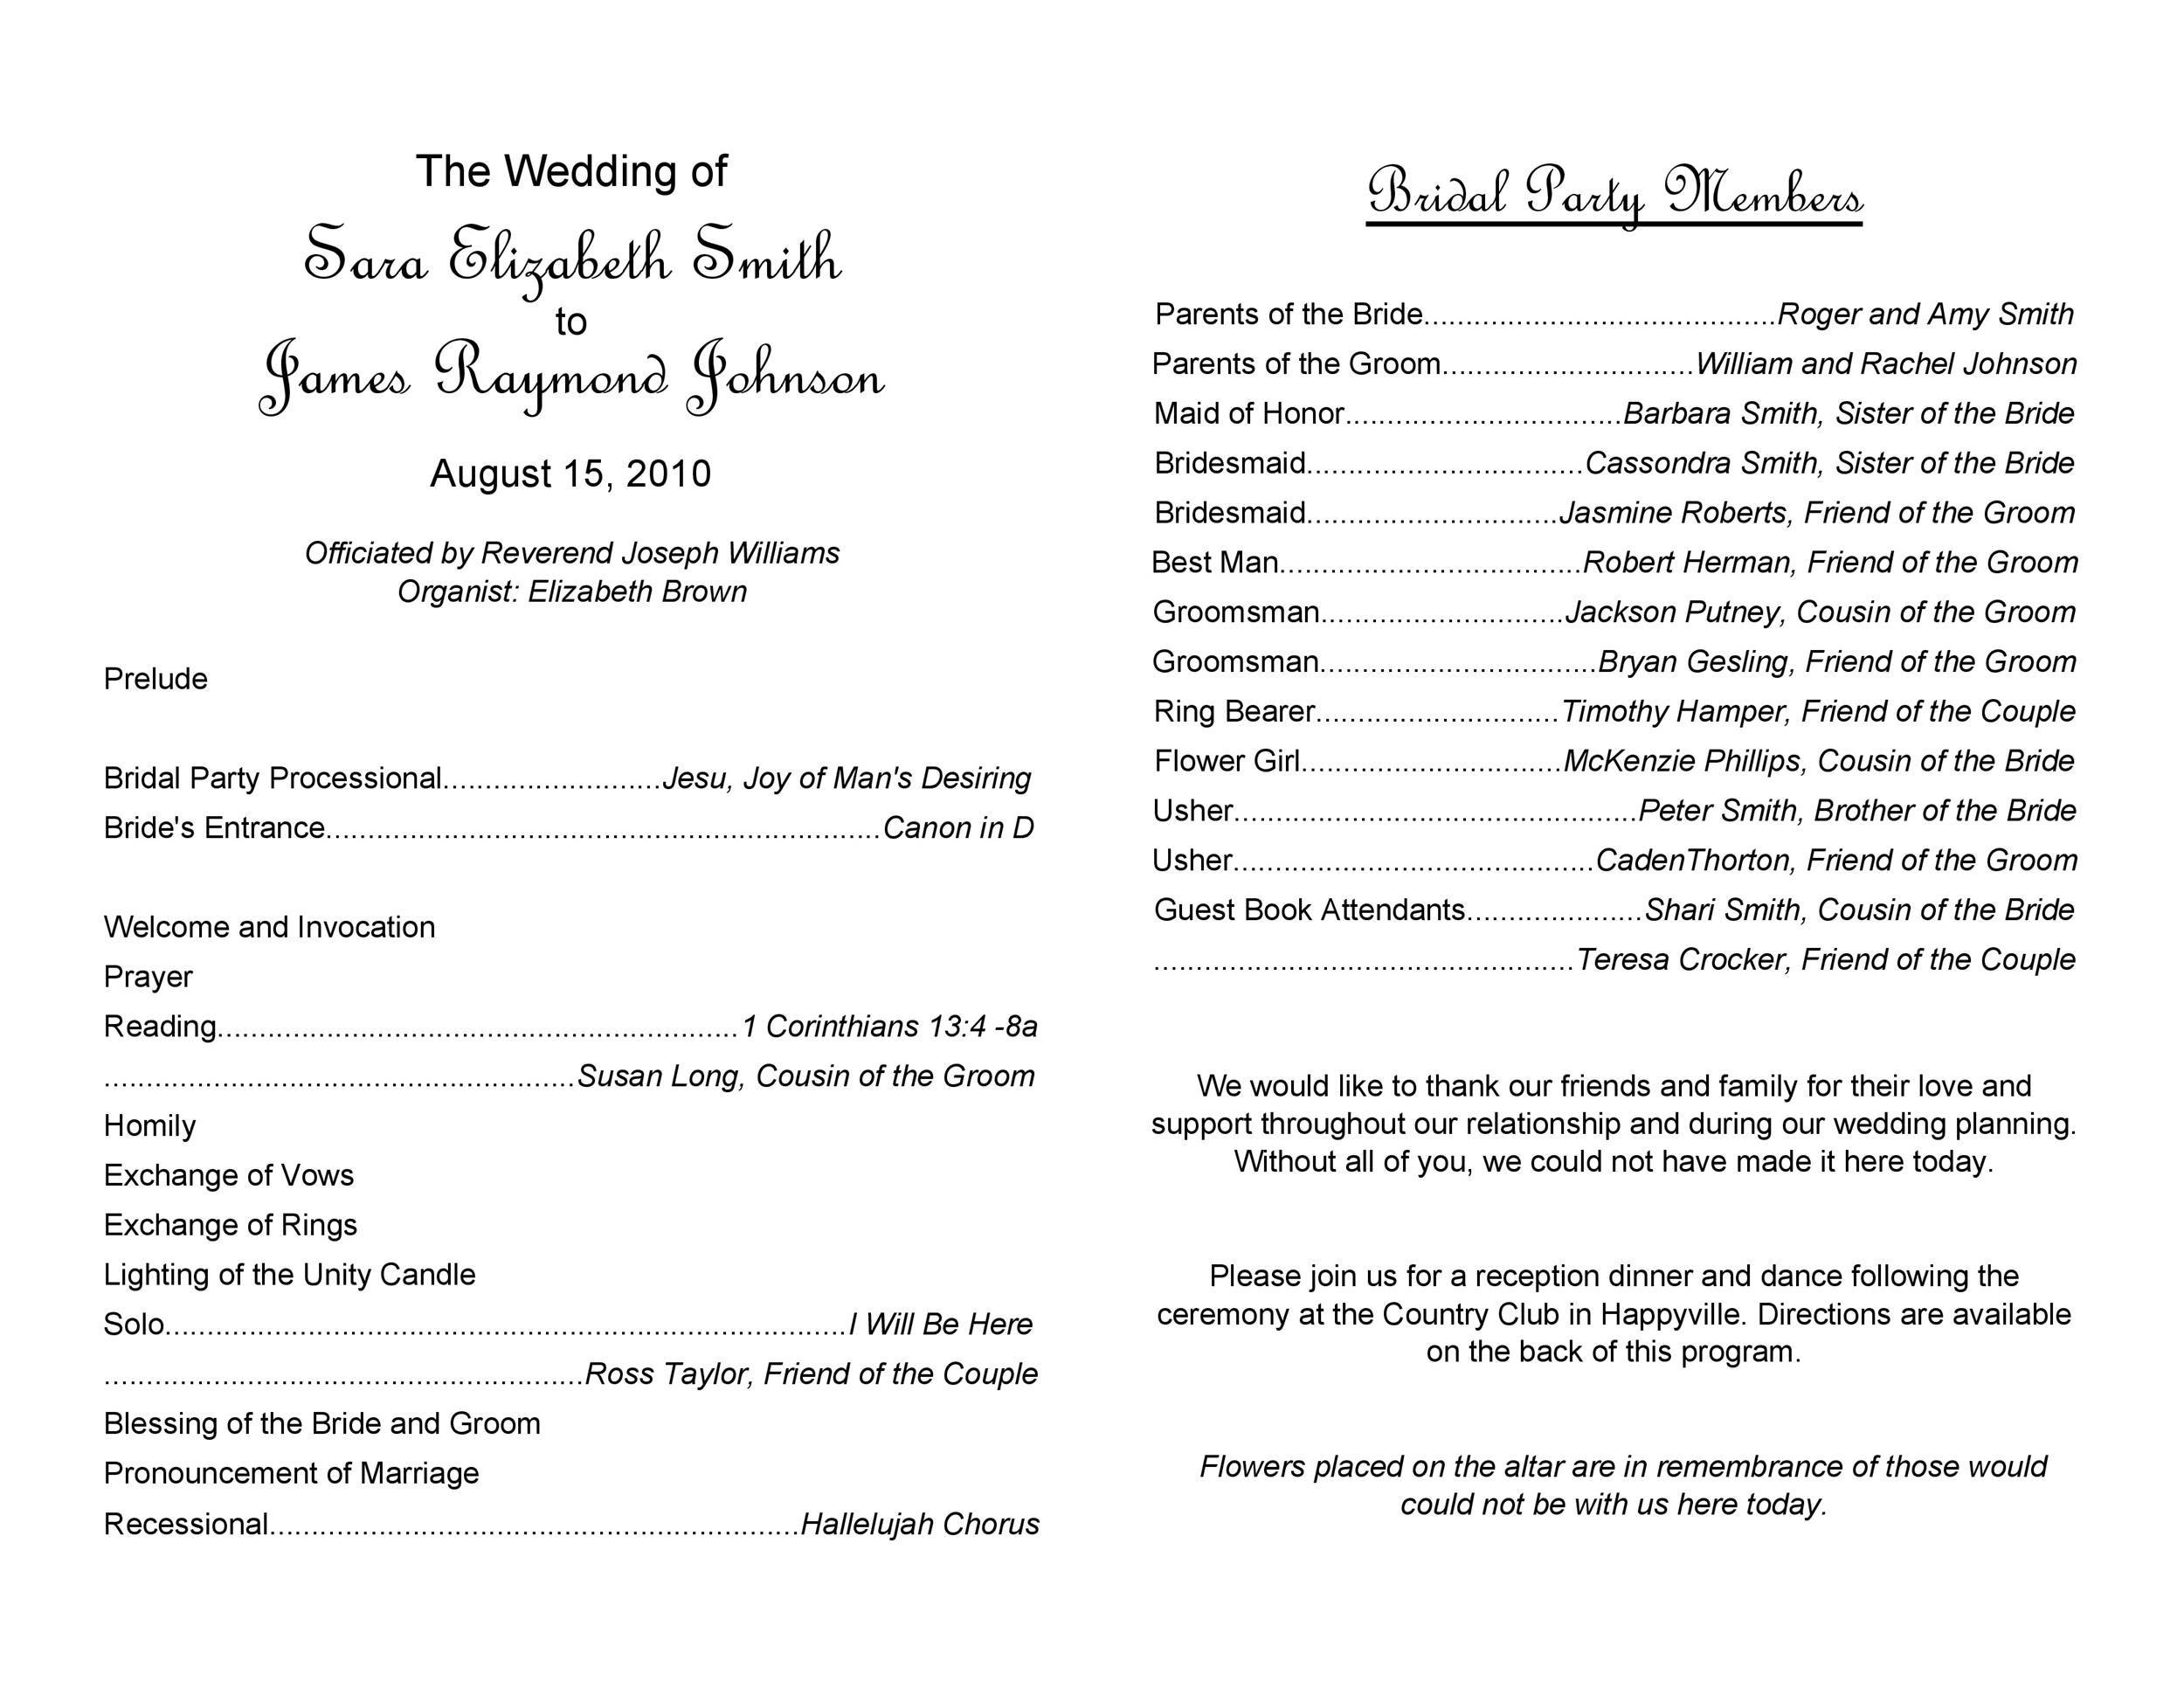 009 Rare Free Download Template For Wedding Program High Resolution  ProgramsFull